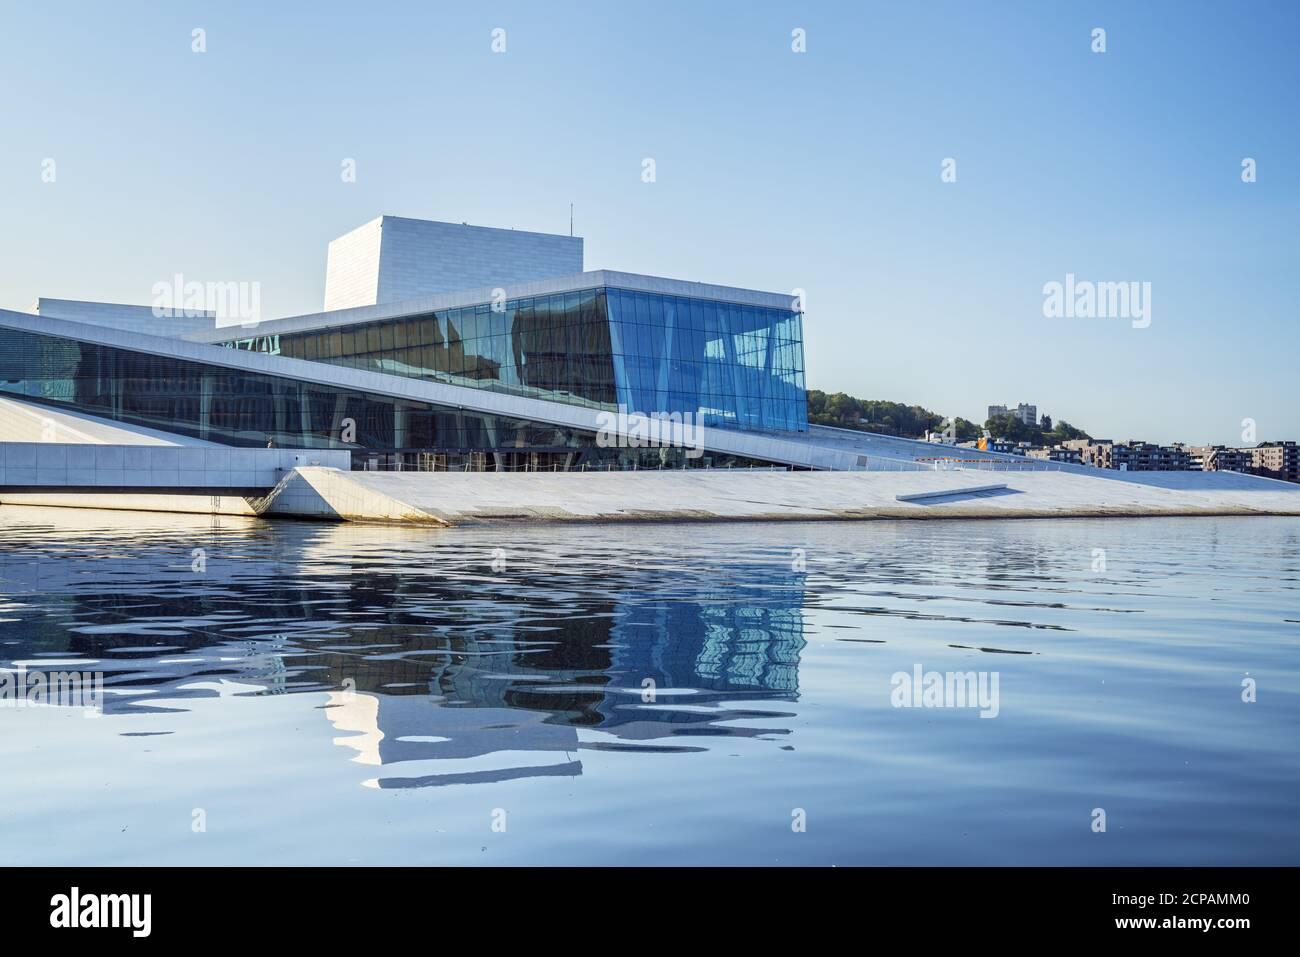 Nueva ópera de la Ópera Noruega en Oslo, Noruega, Escandinavia, Norte de Europa, Europa Foto de stock